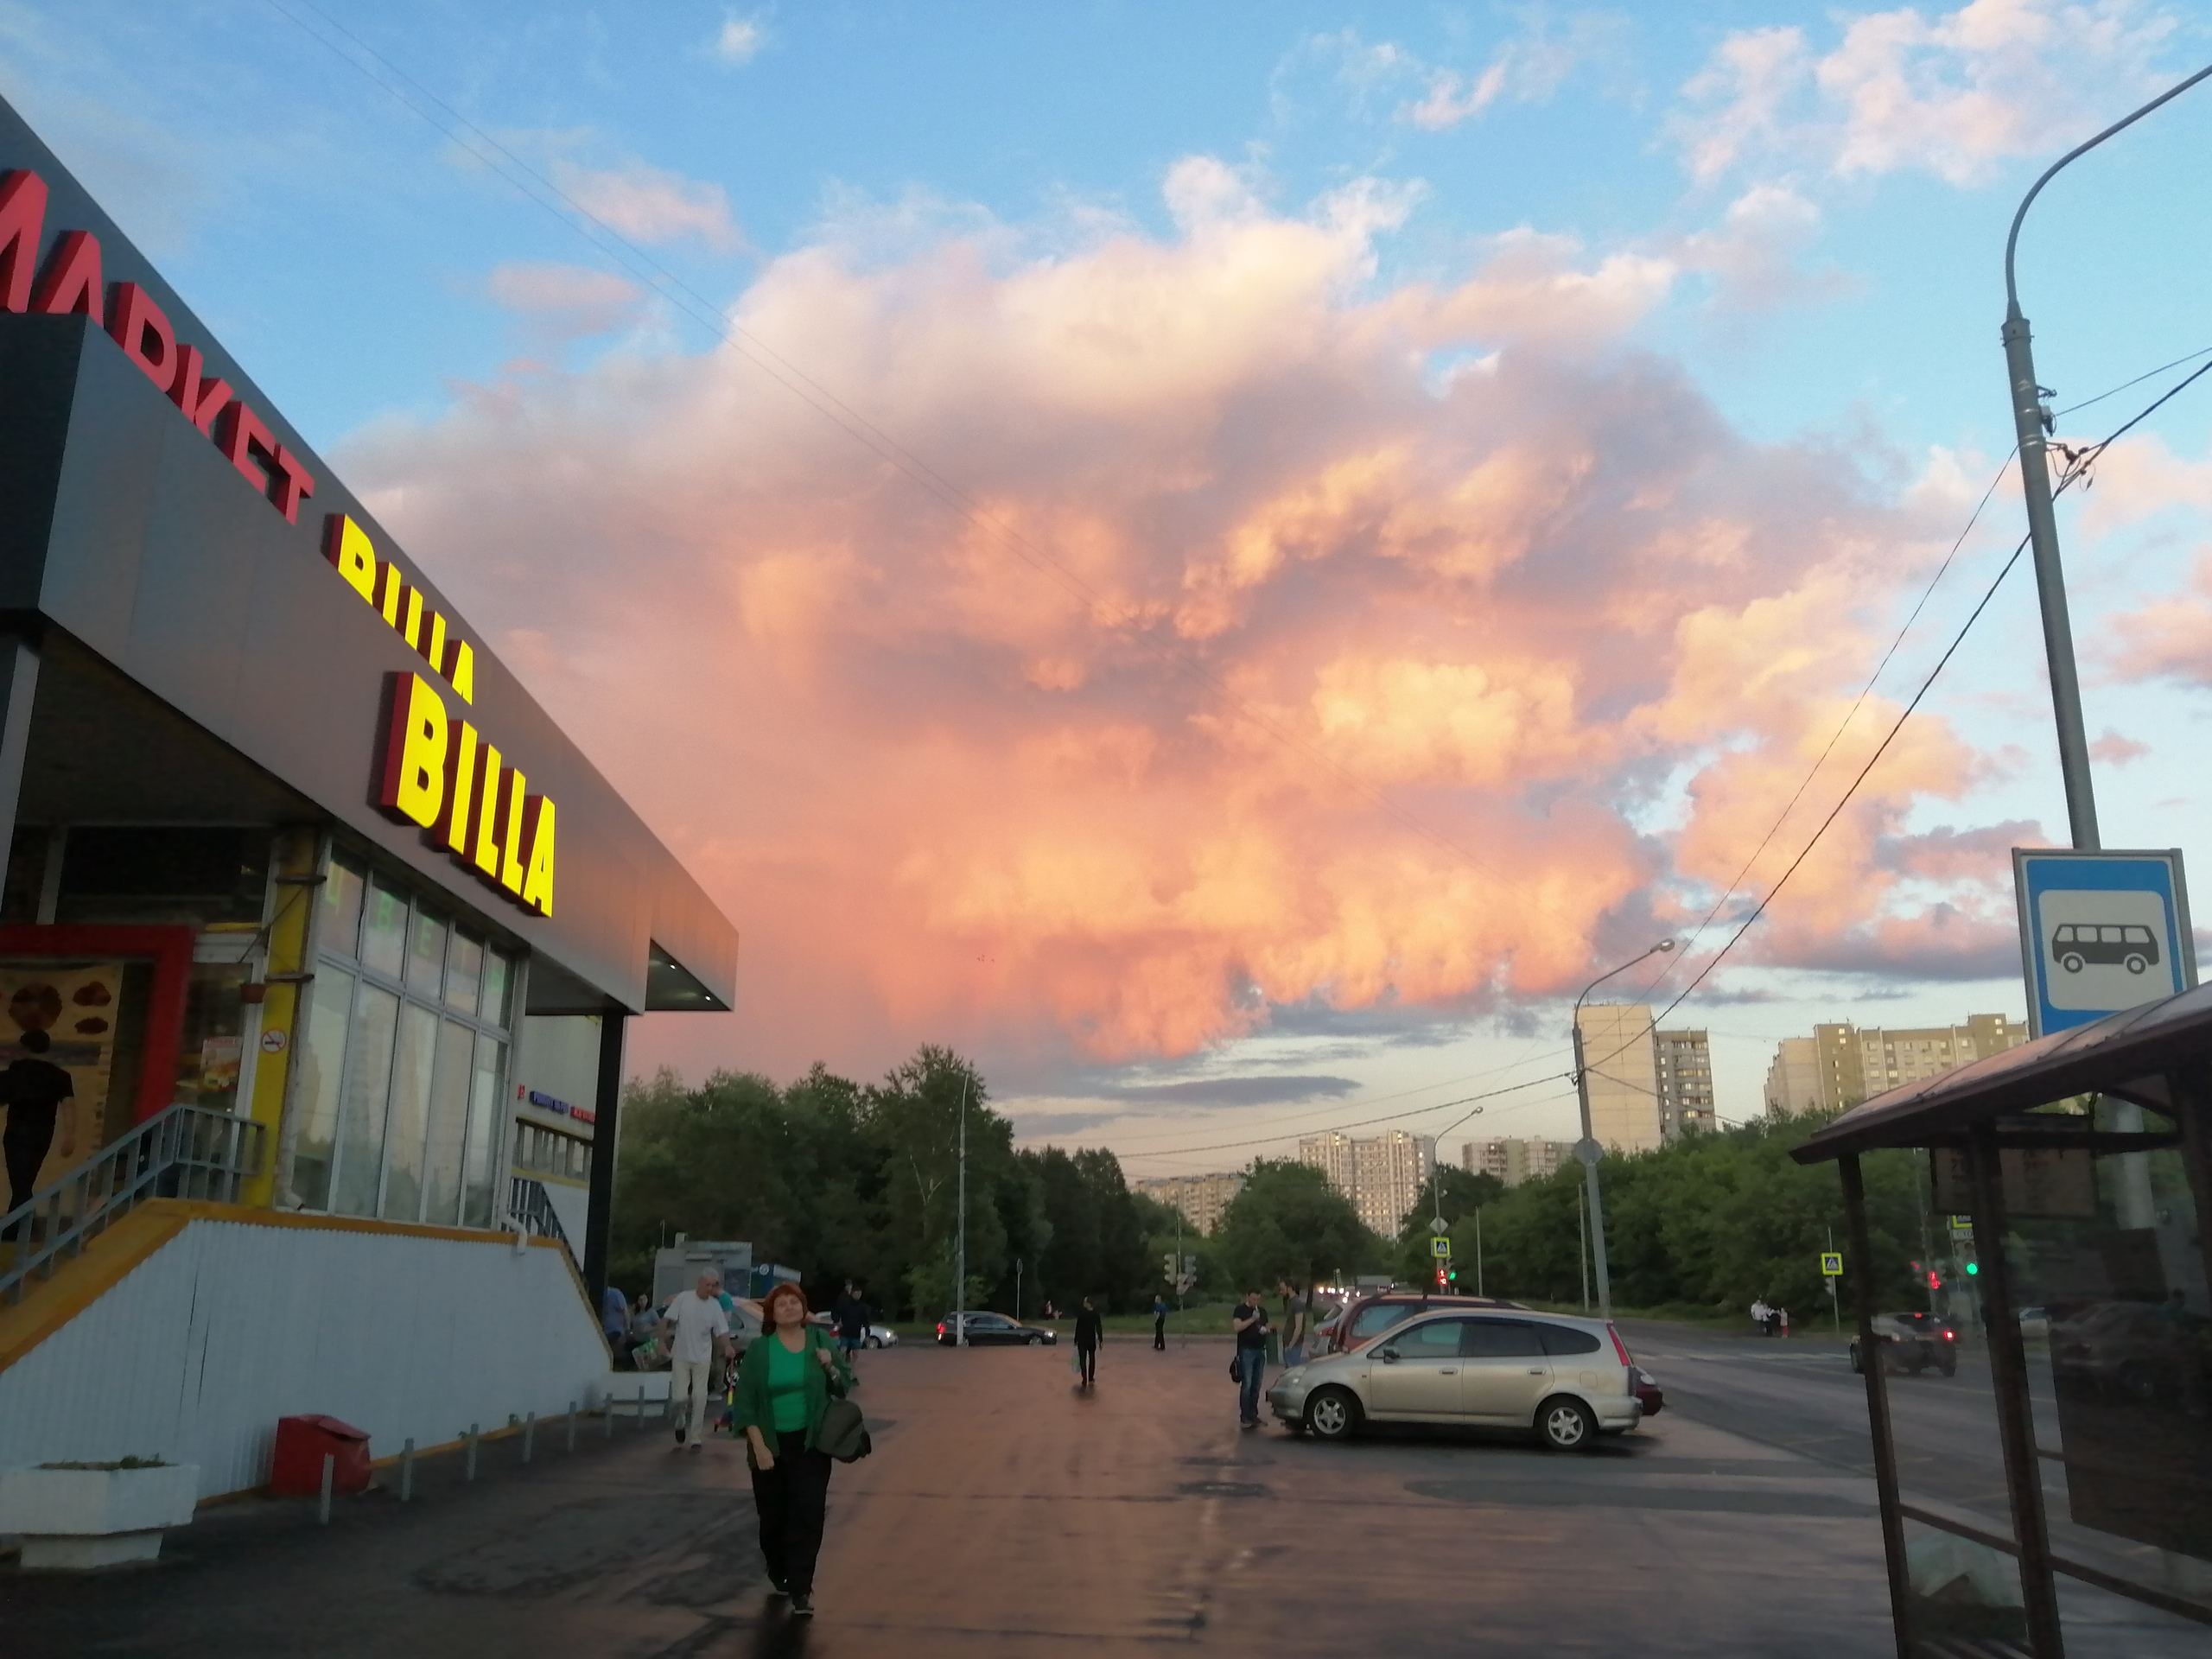 c67f66fbb4f9 И облака в закатном небе тоже прекрасны.